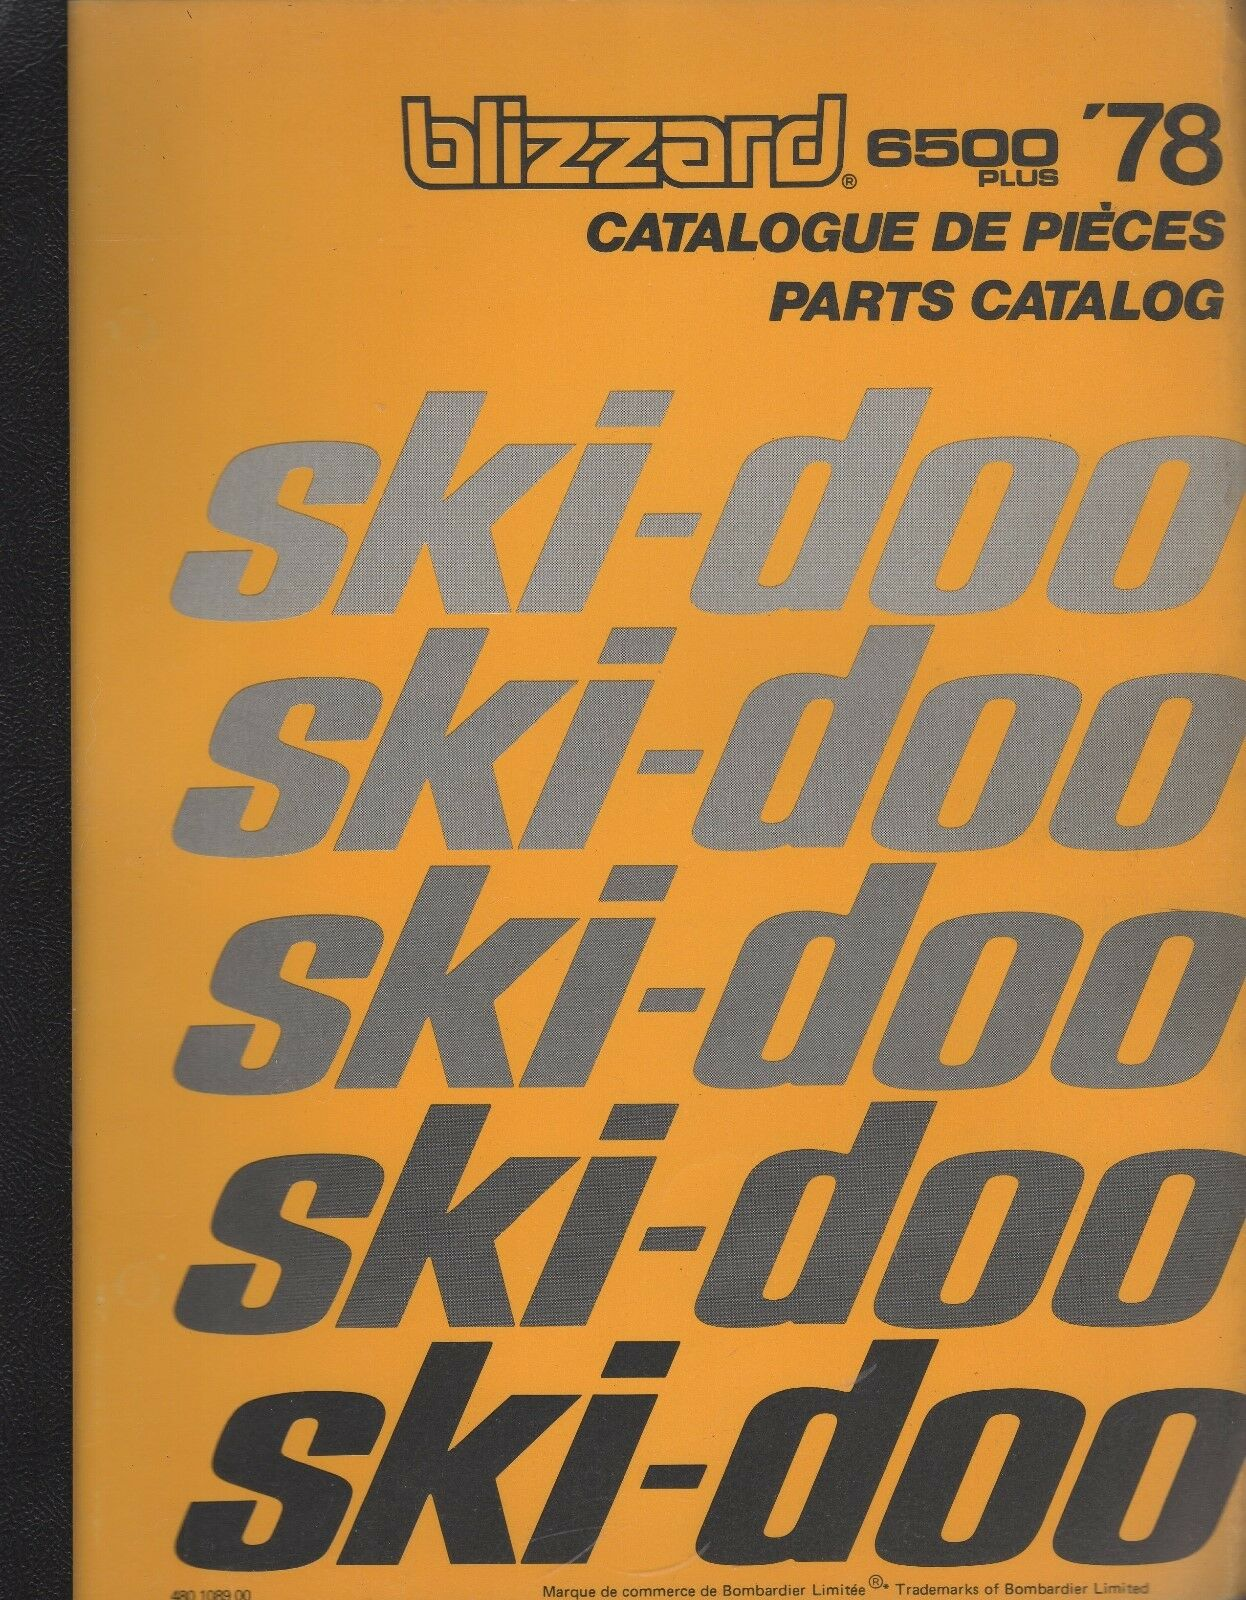 1978 SKI-DOO BLIZZARD 6500 PLUS SNOWMOBILE PARTS MANUAL 480 1089 00 (588)